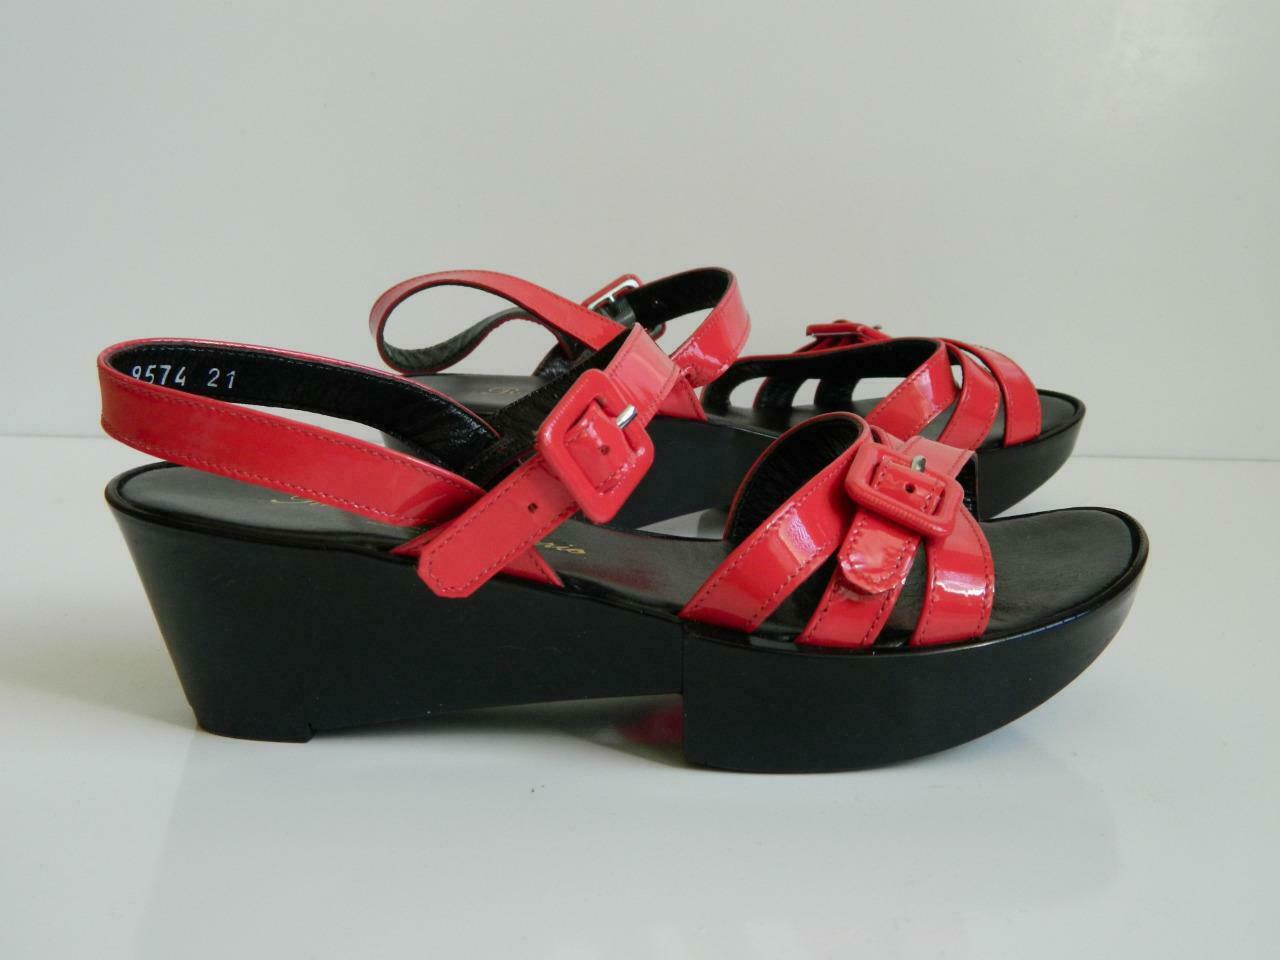 Robert Clergerie Sandals Patent Leather Moren Strappy Wedge Platform 5